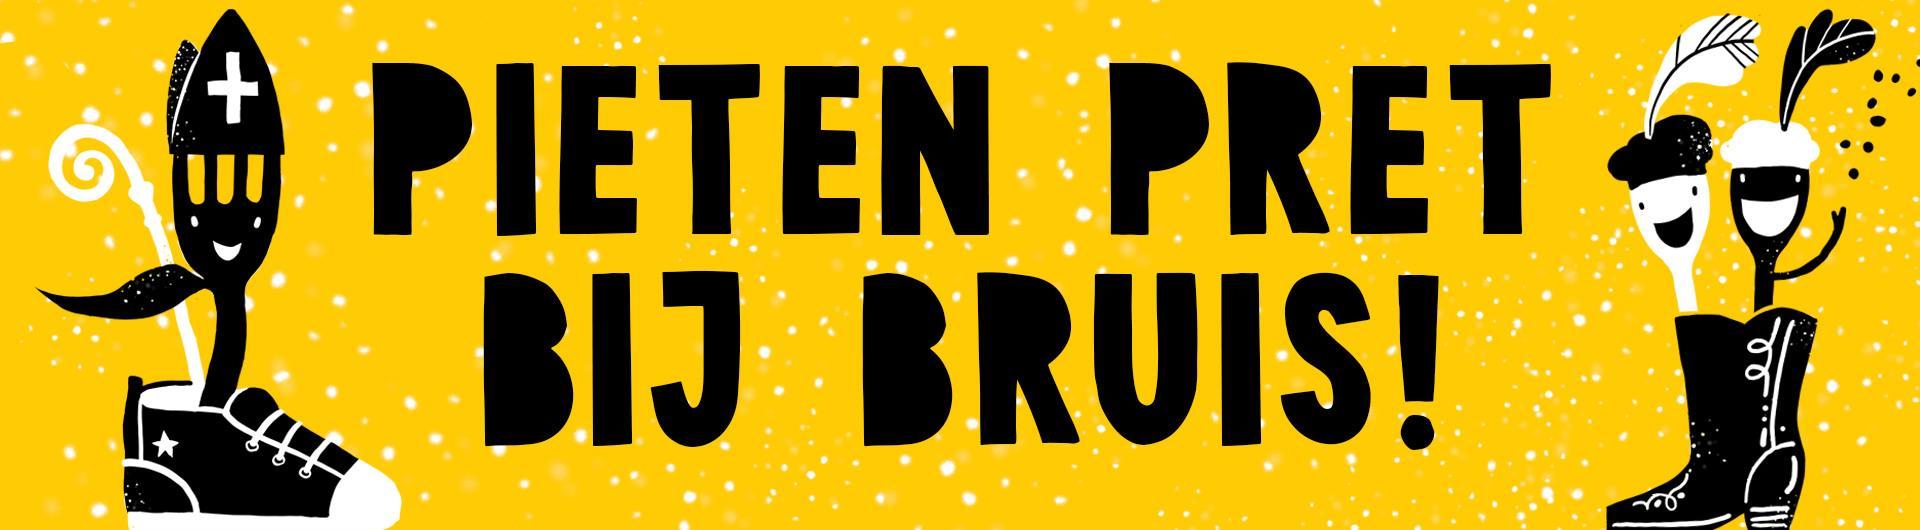 PietenPret-Bruis-Blaricum-Sinterklaas